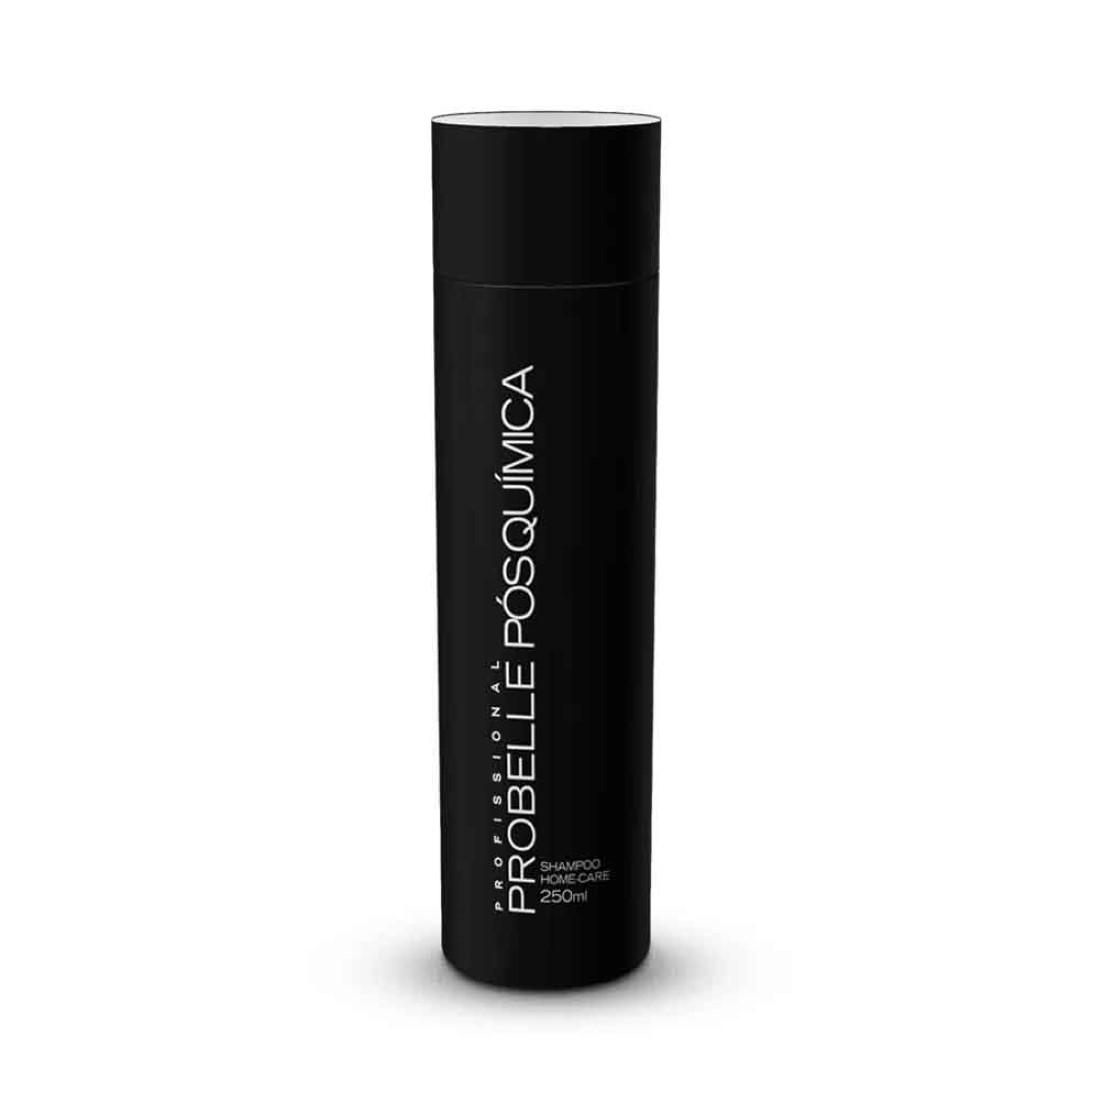 Shampoo Home-Care Pós Quimica 250ml - Probelle